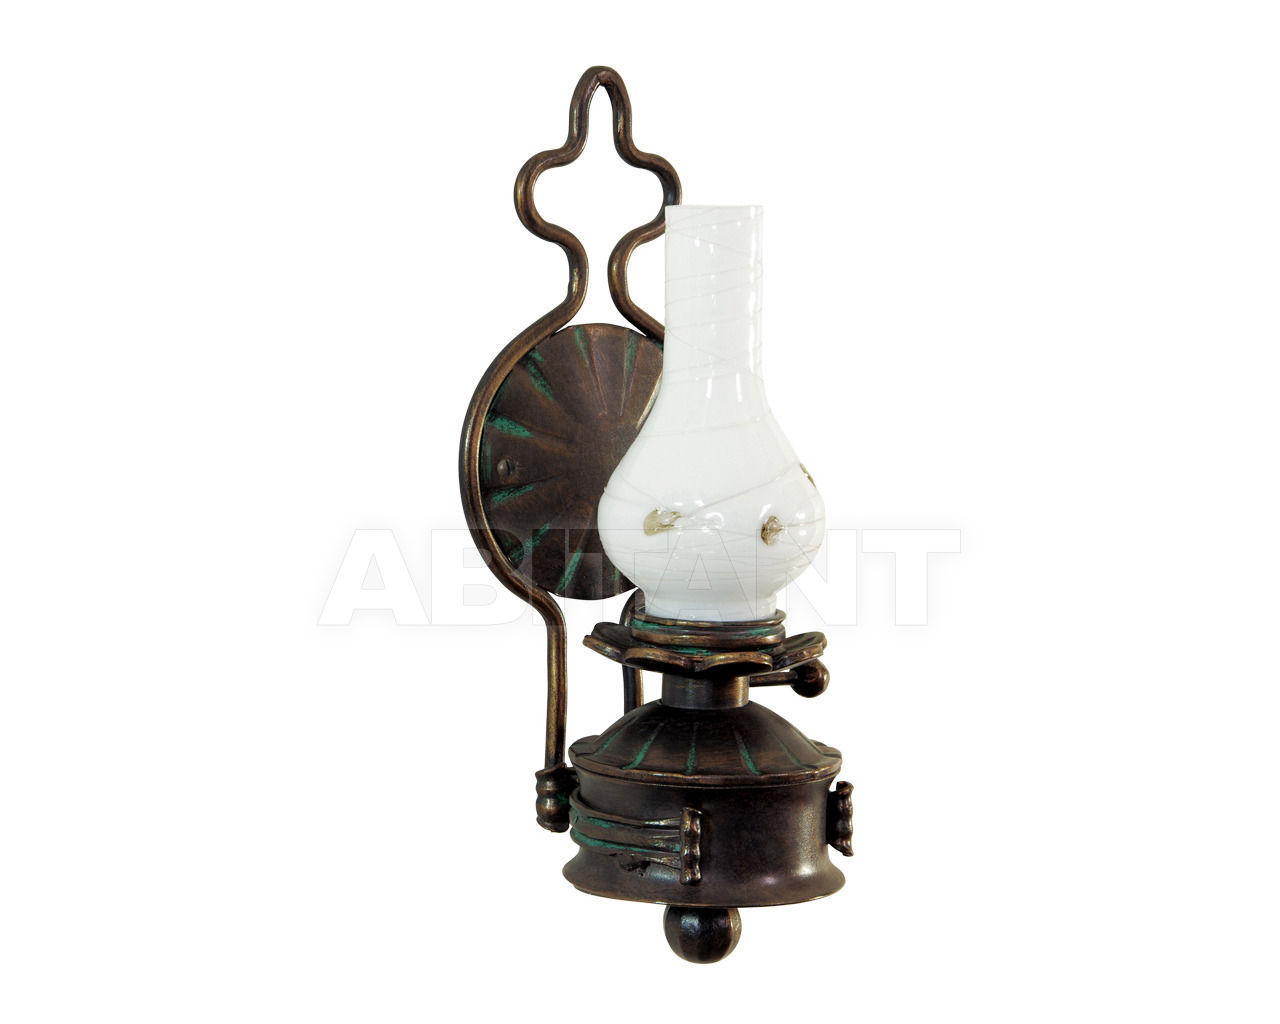 Купить Светильник настенный FMB Leuchten Schmiedeeisen Lampen Und Leuchten 94090